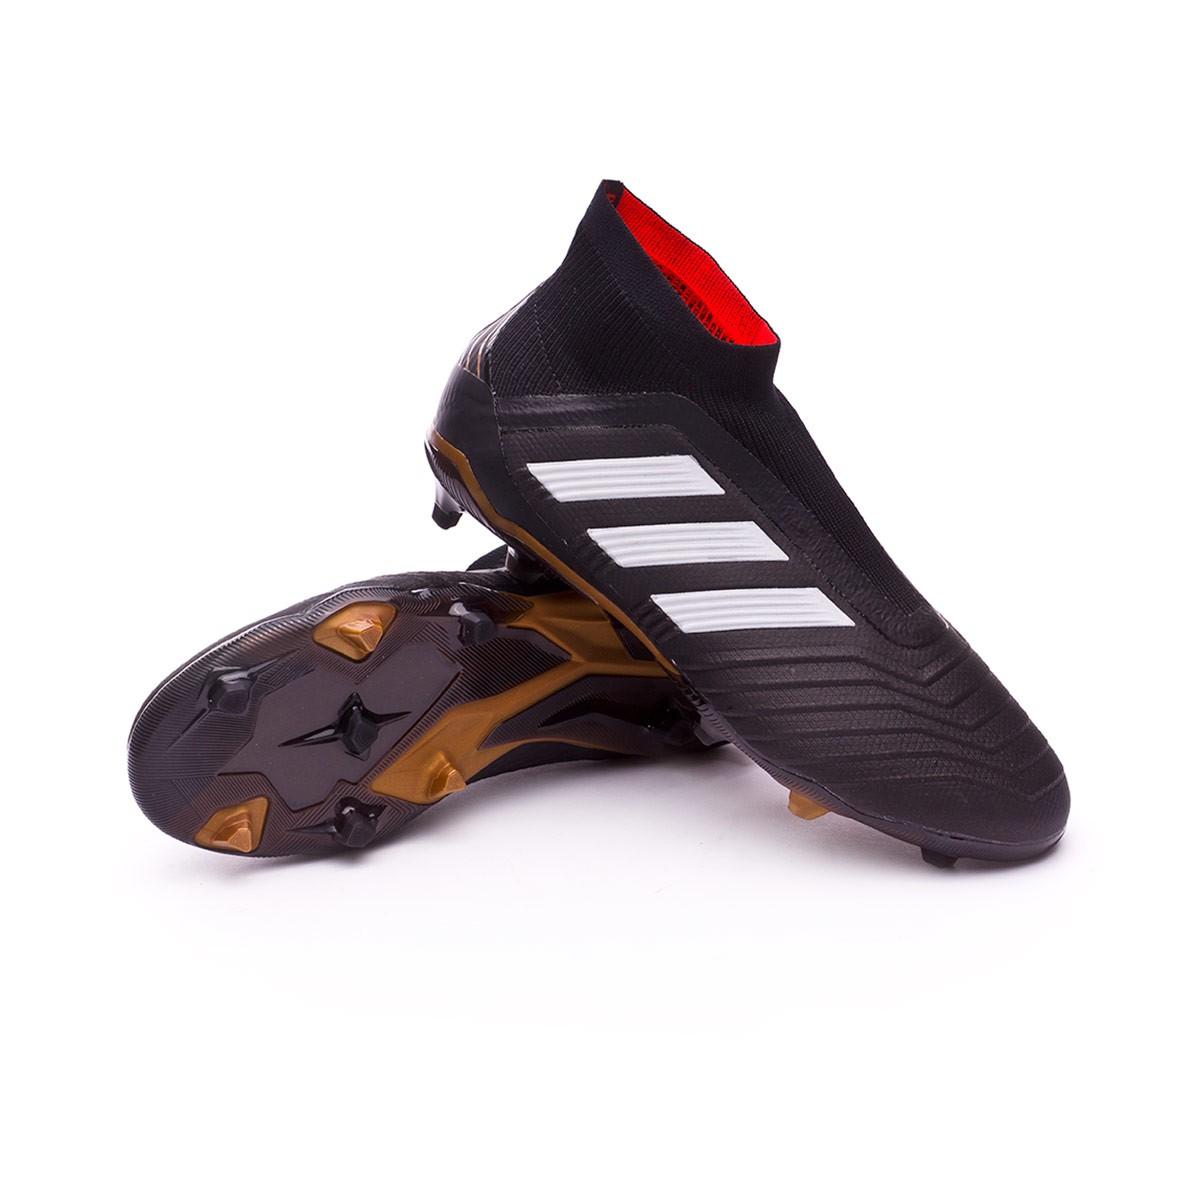 dd951c067a009 Bota de fútbol adidas Predator 18+ FG Niño Core black-White-Gold  metallic-Solar red - Tienda de fútbol Fútbol Emotion